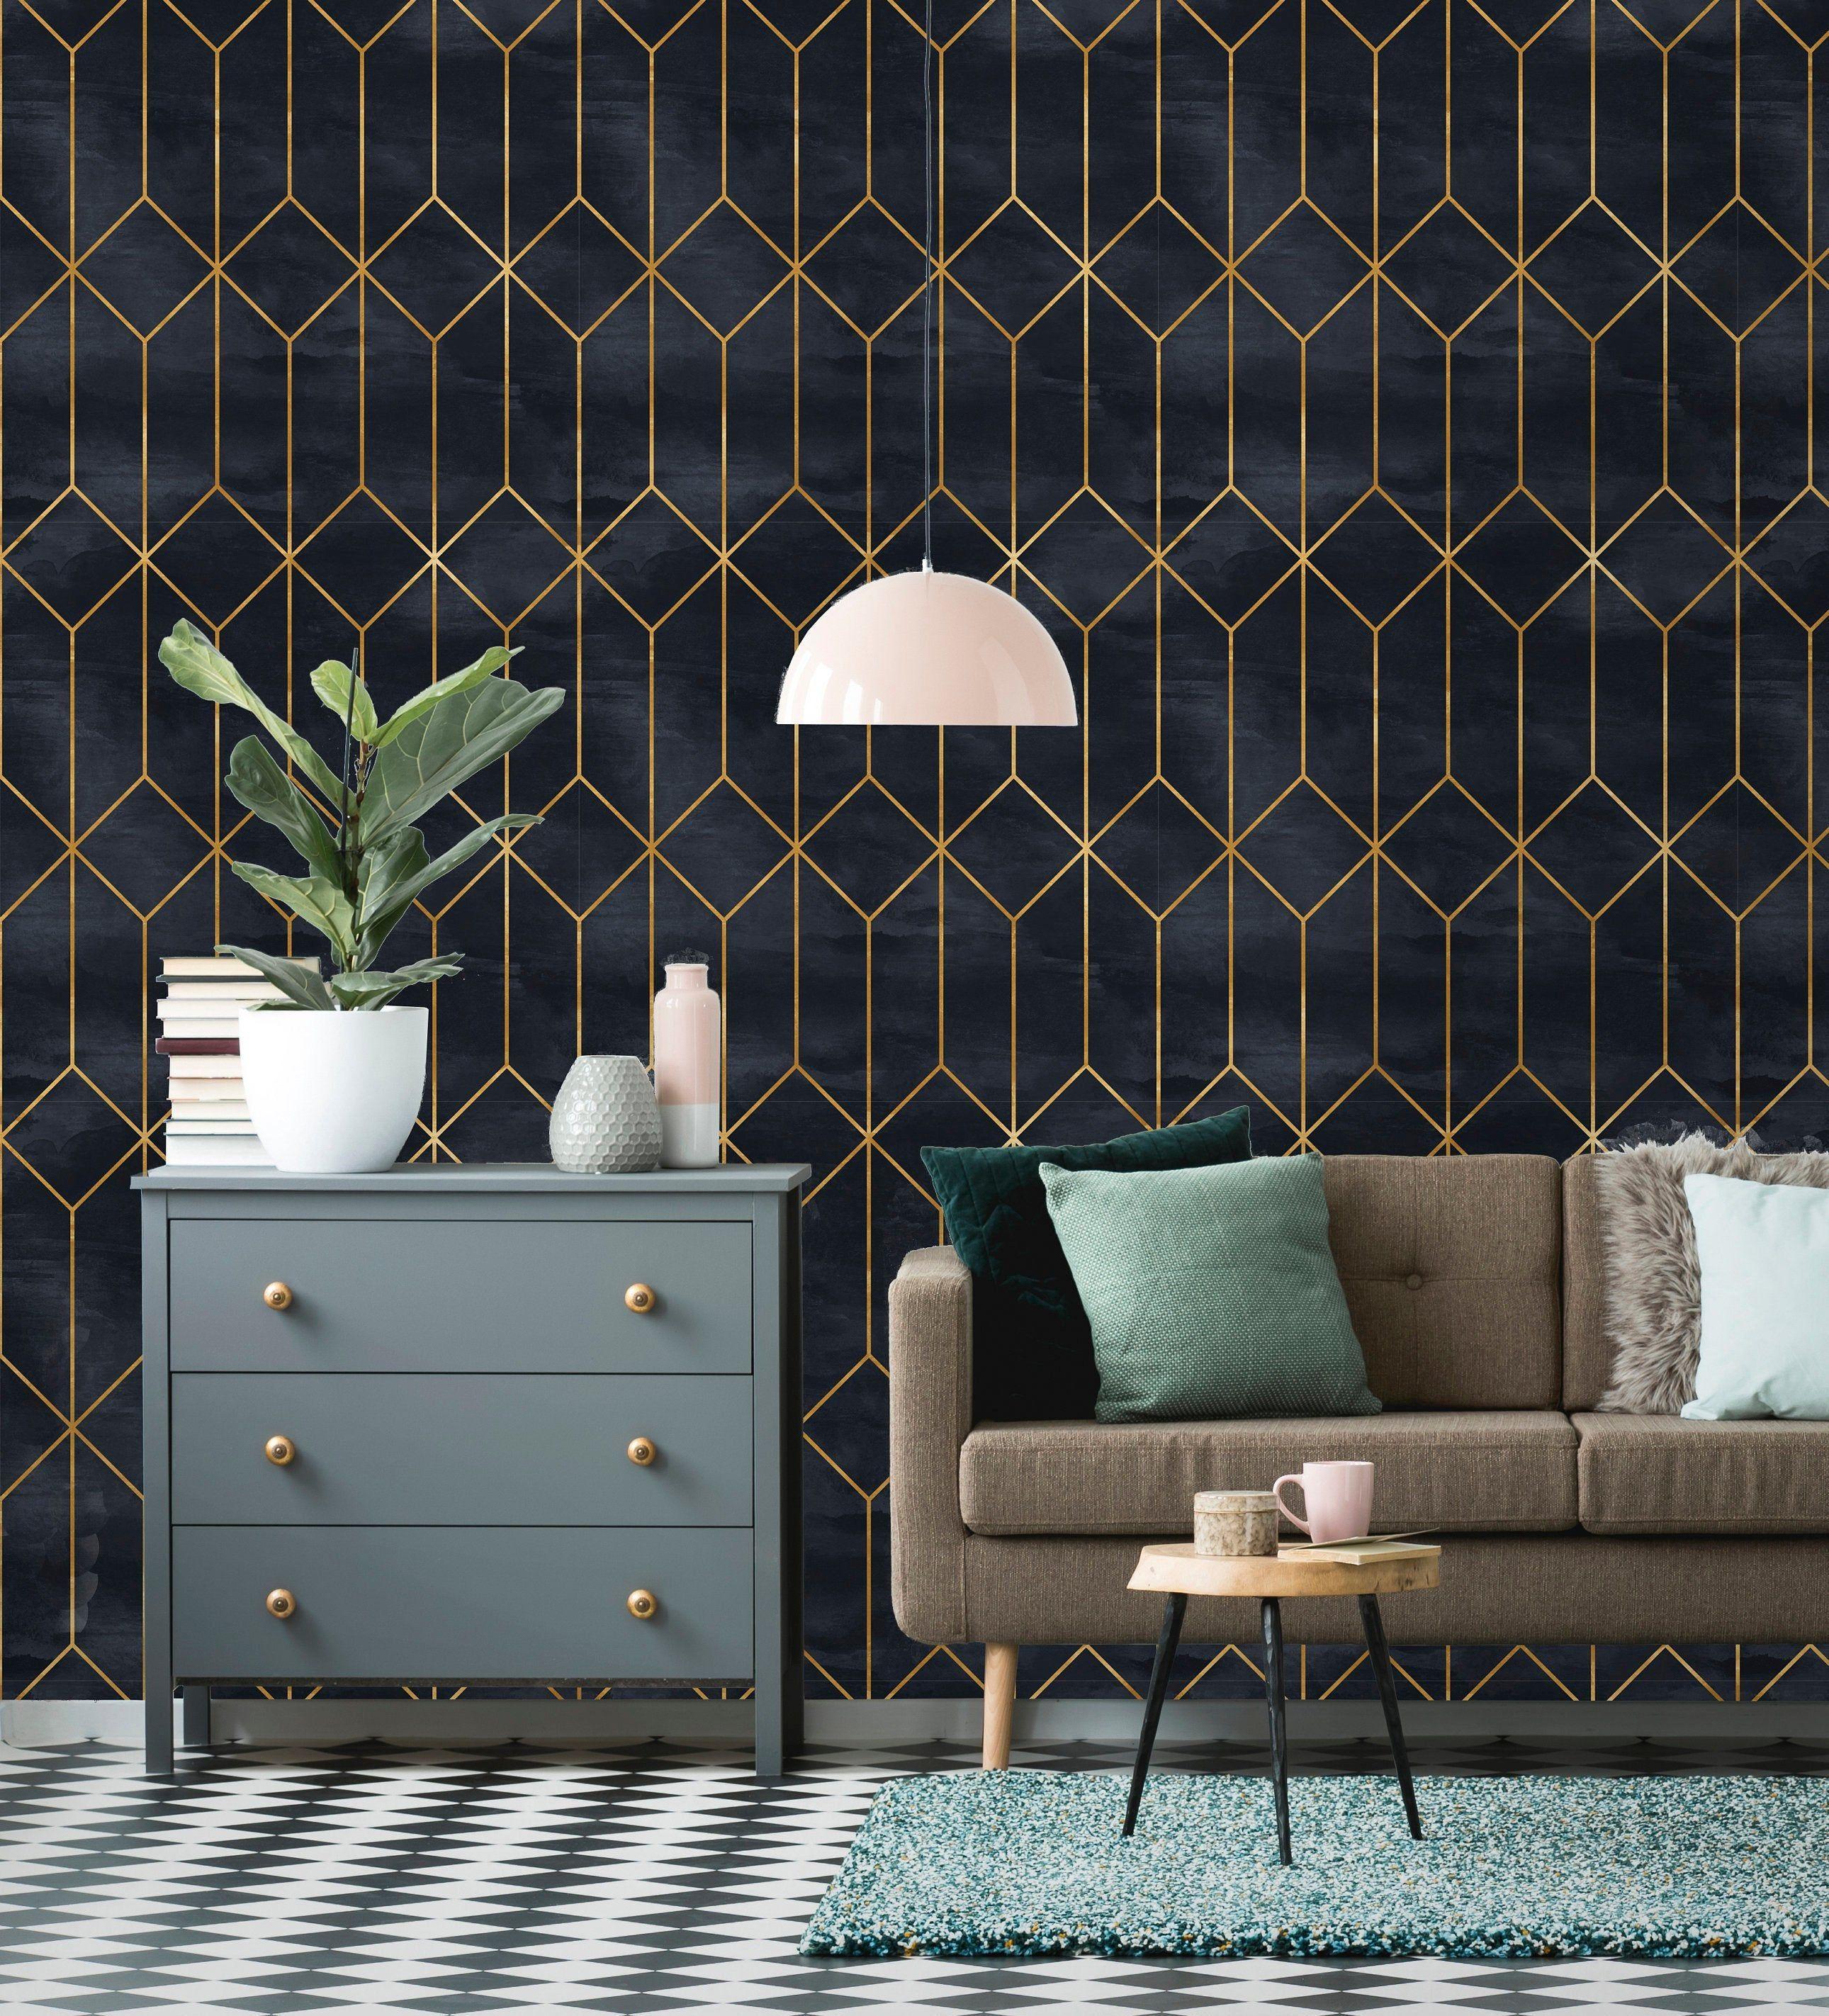 Removable Wallpaper Peel And Stick Geometric Wallpaper Etsy Art Deco Wallpaper Interior Deco Art Deco Interior